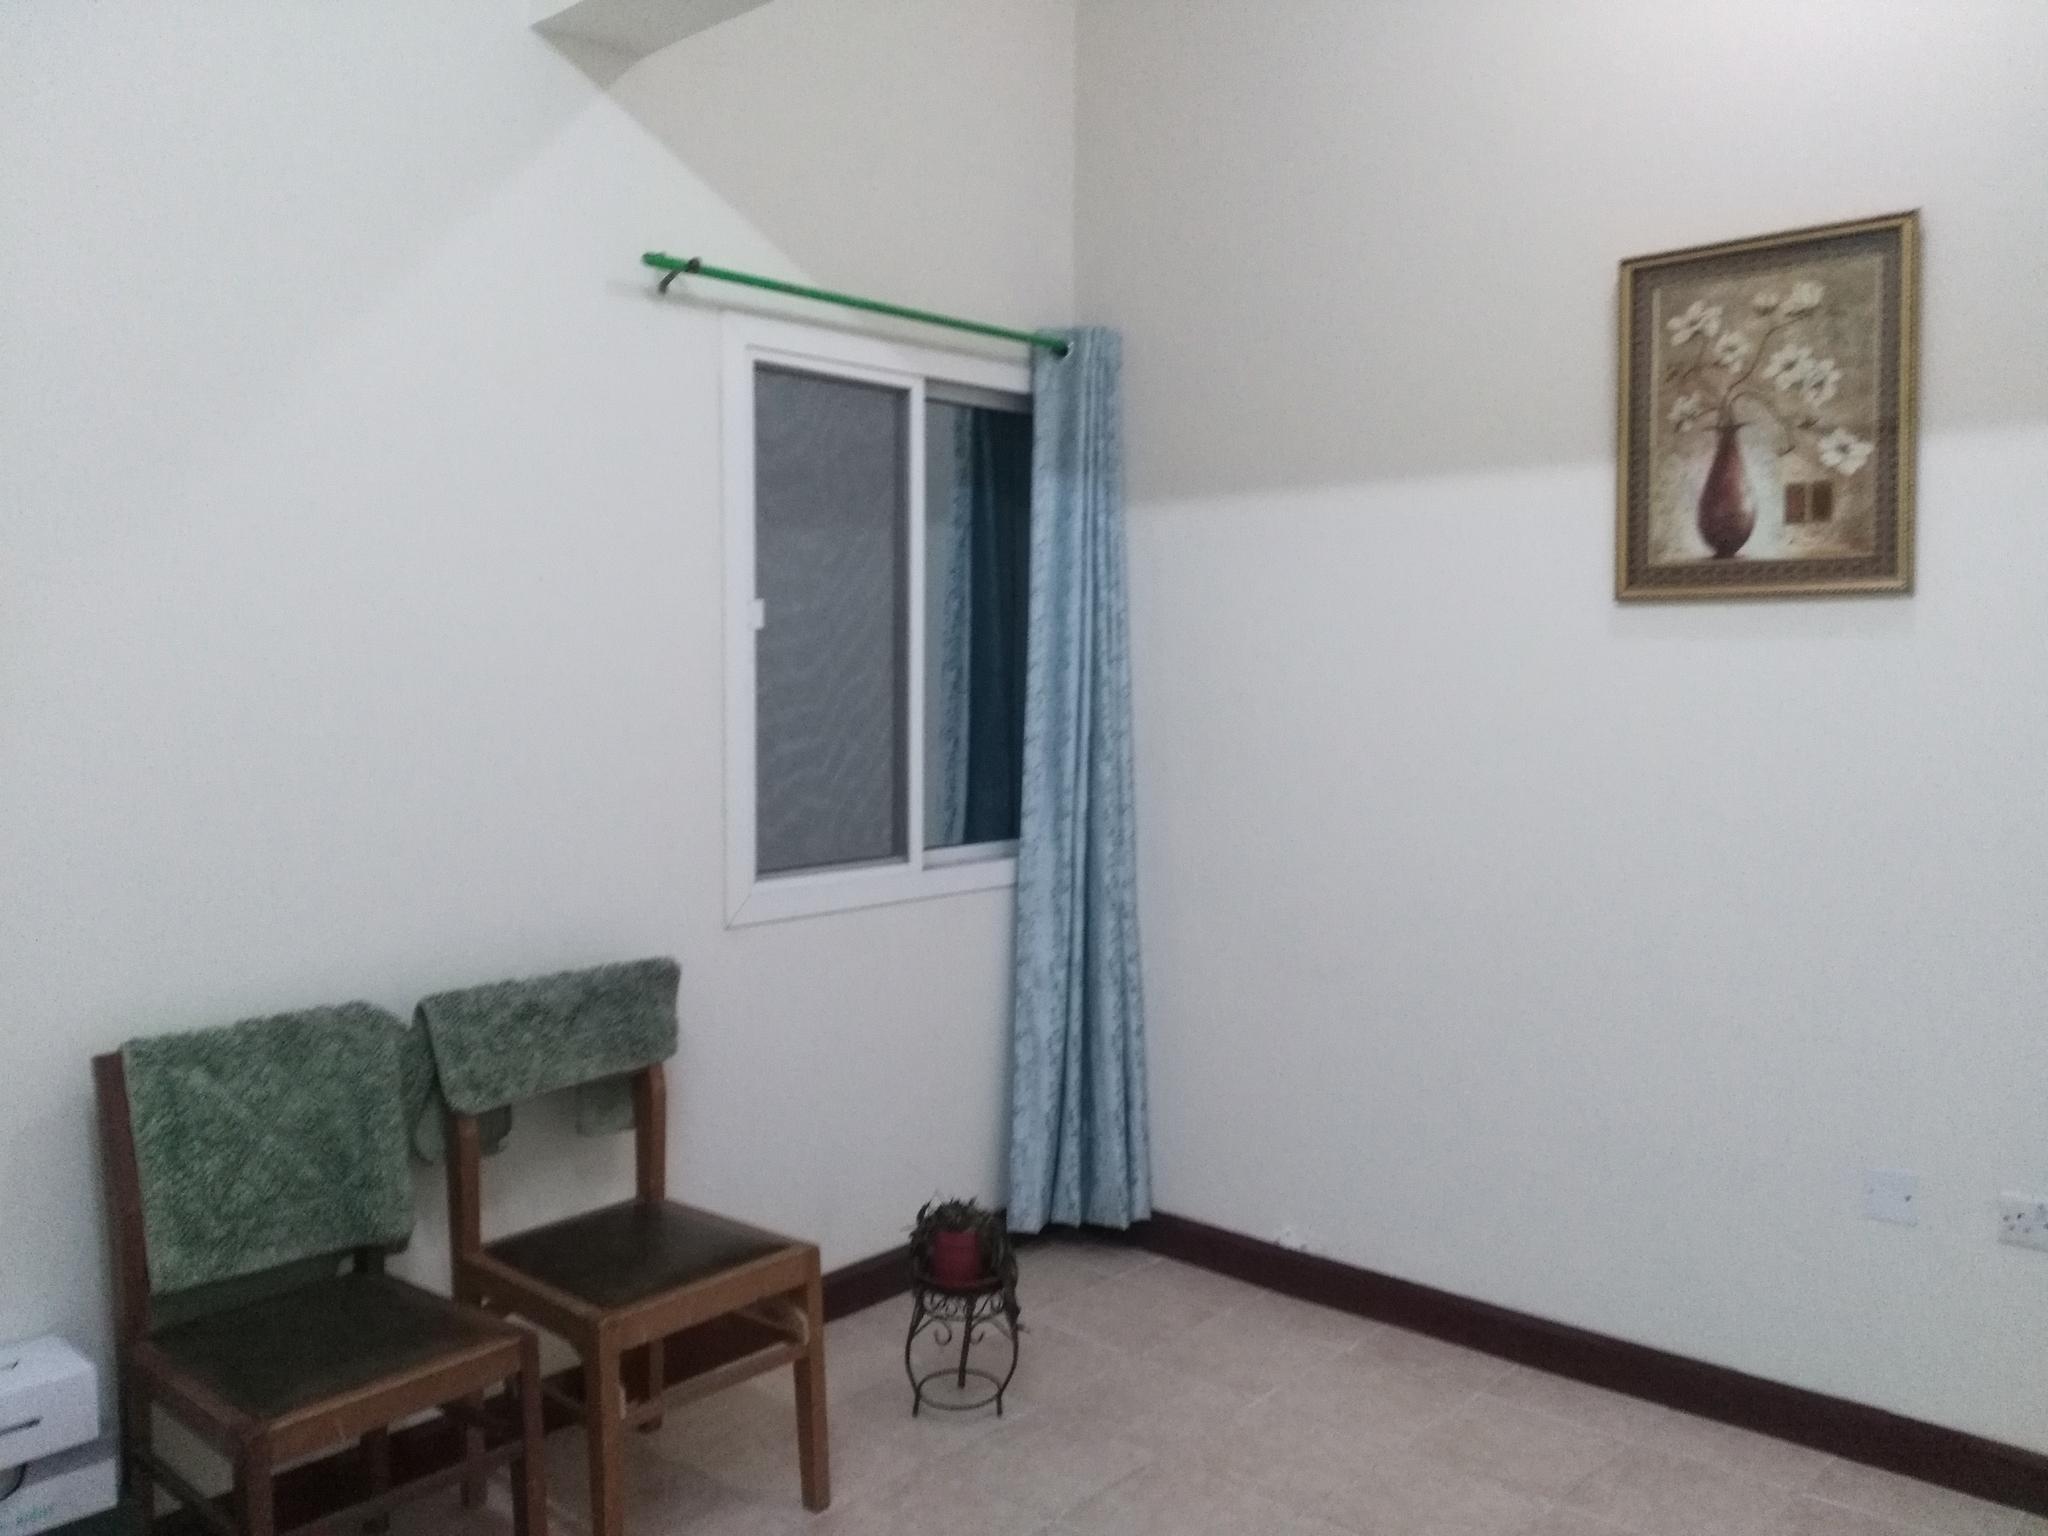 Spacious Concrete Room for Rent